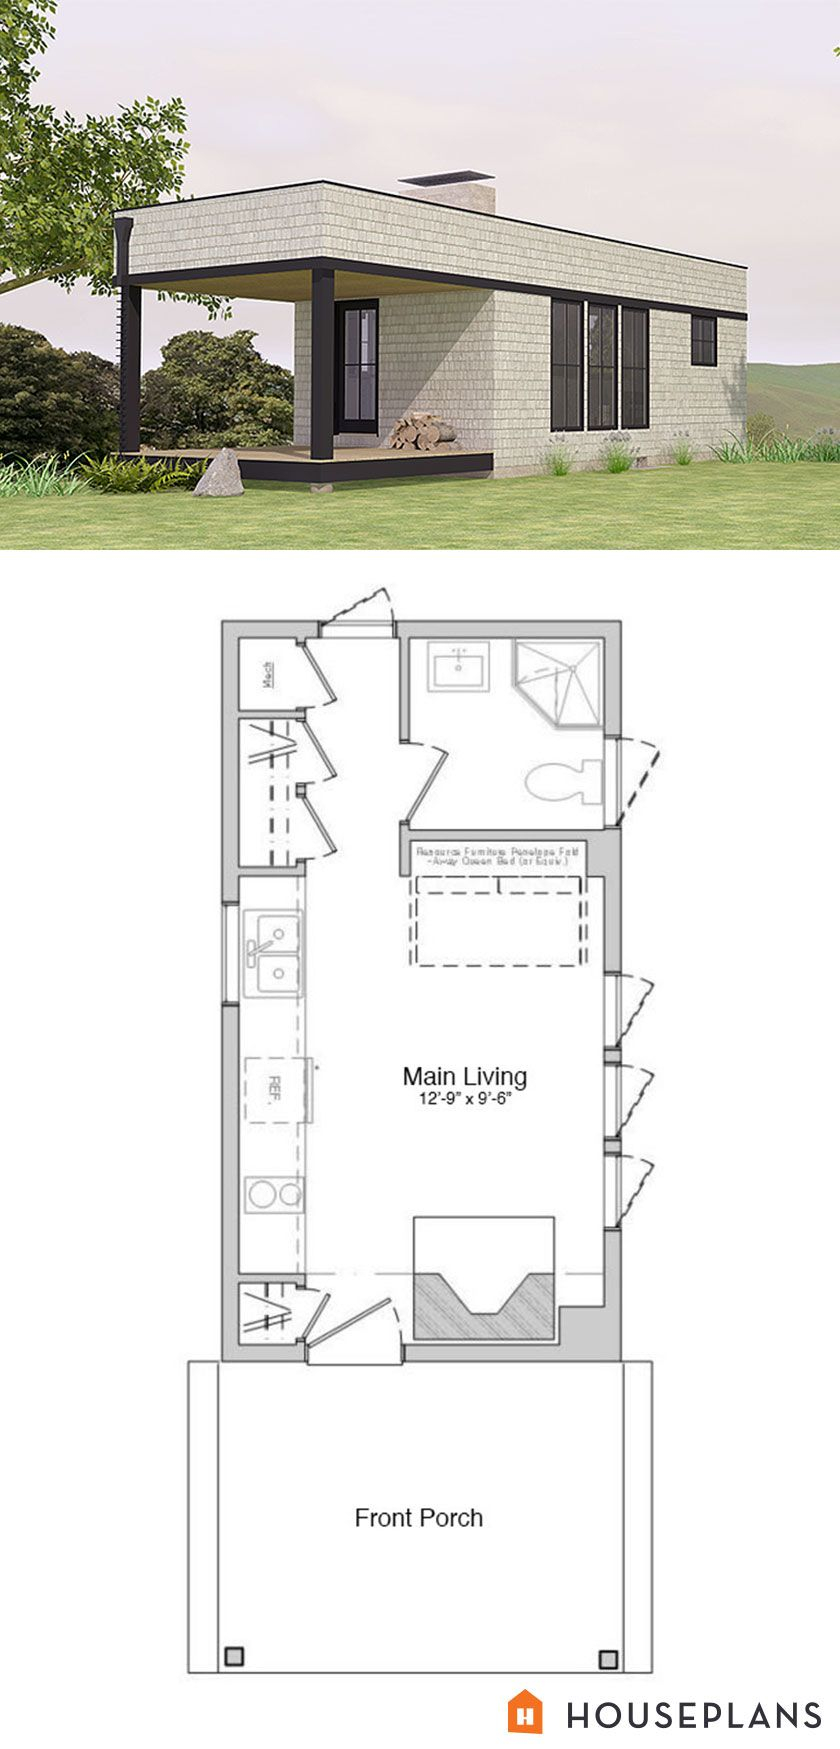 300 Sft Modern Cabin Floorplan 1 Bedroom 1 Bathroom